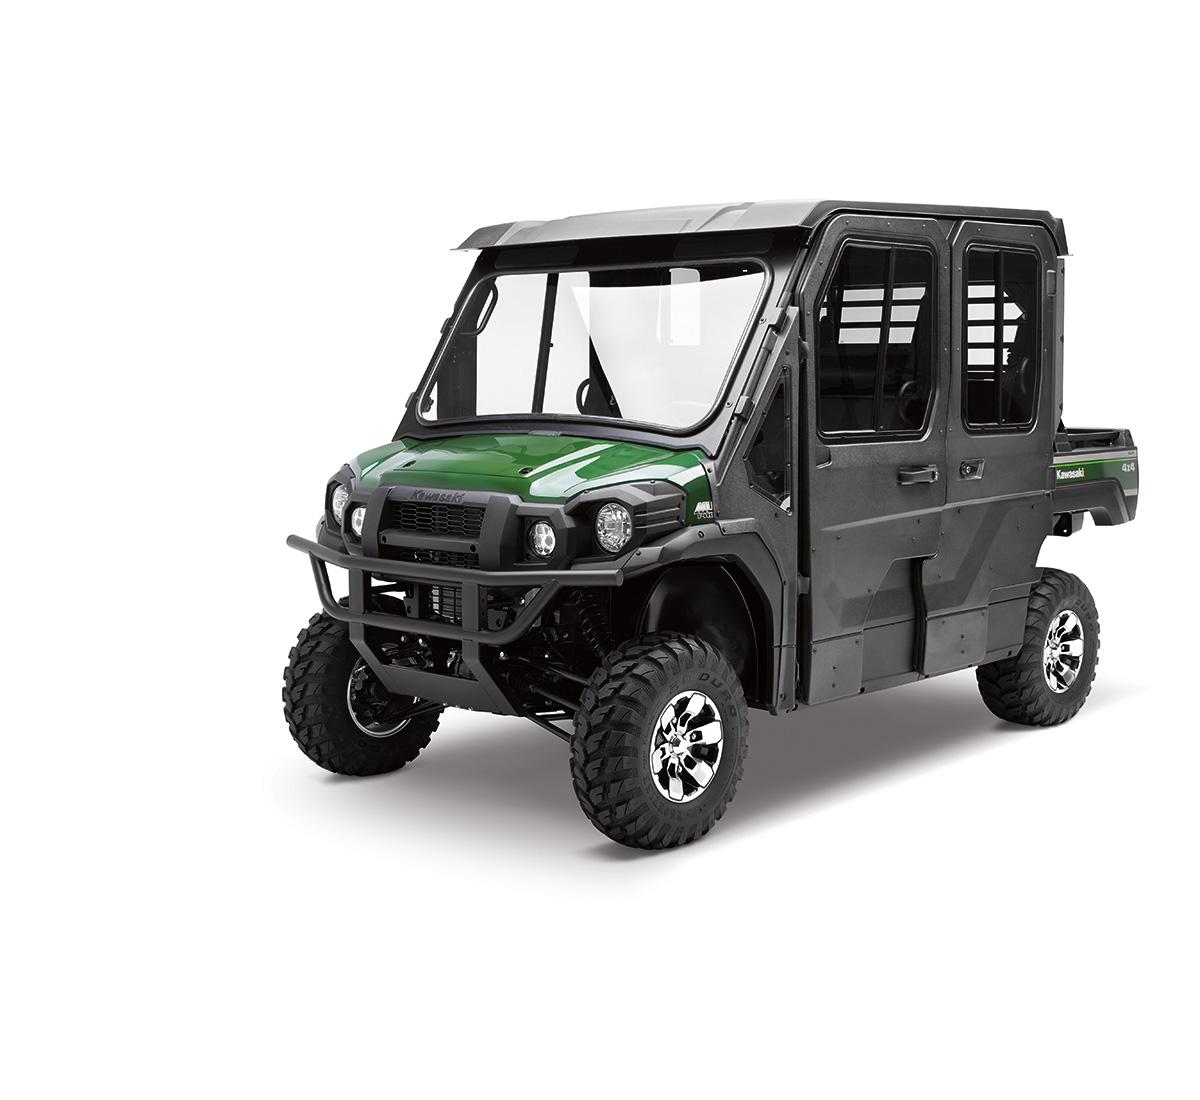 2017 mule pro-fxt™ mule™ pro series side x sidekawasaki